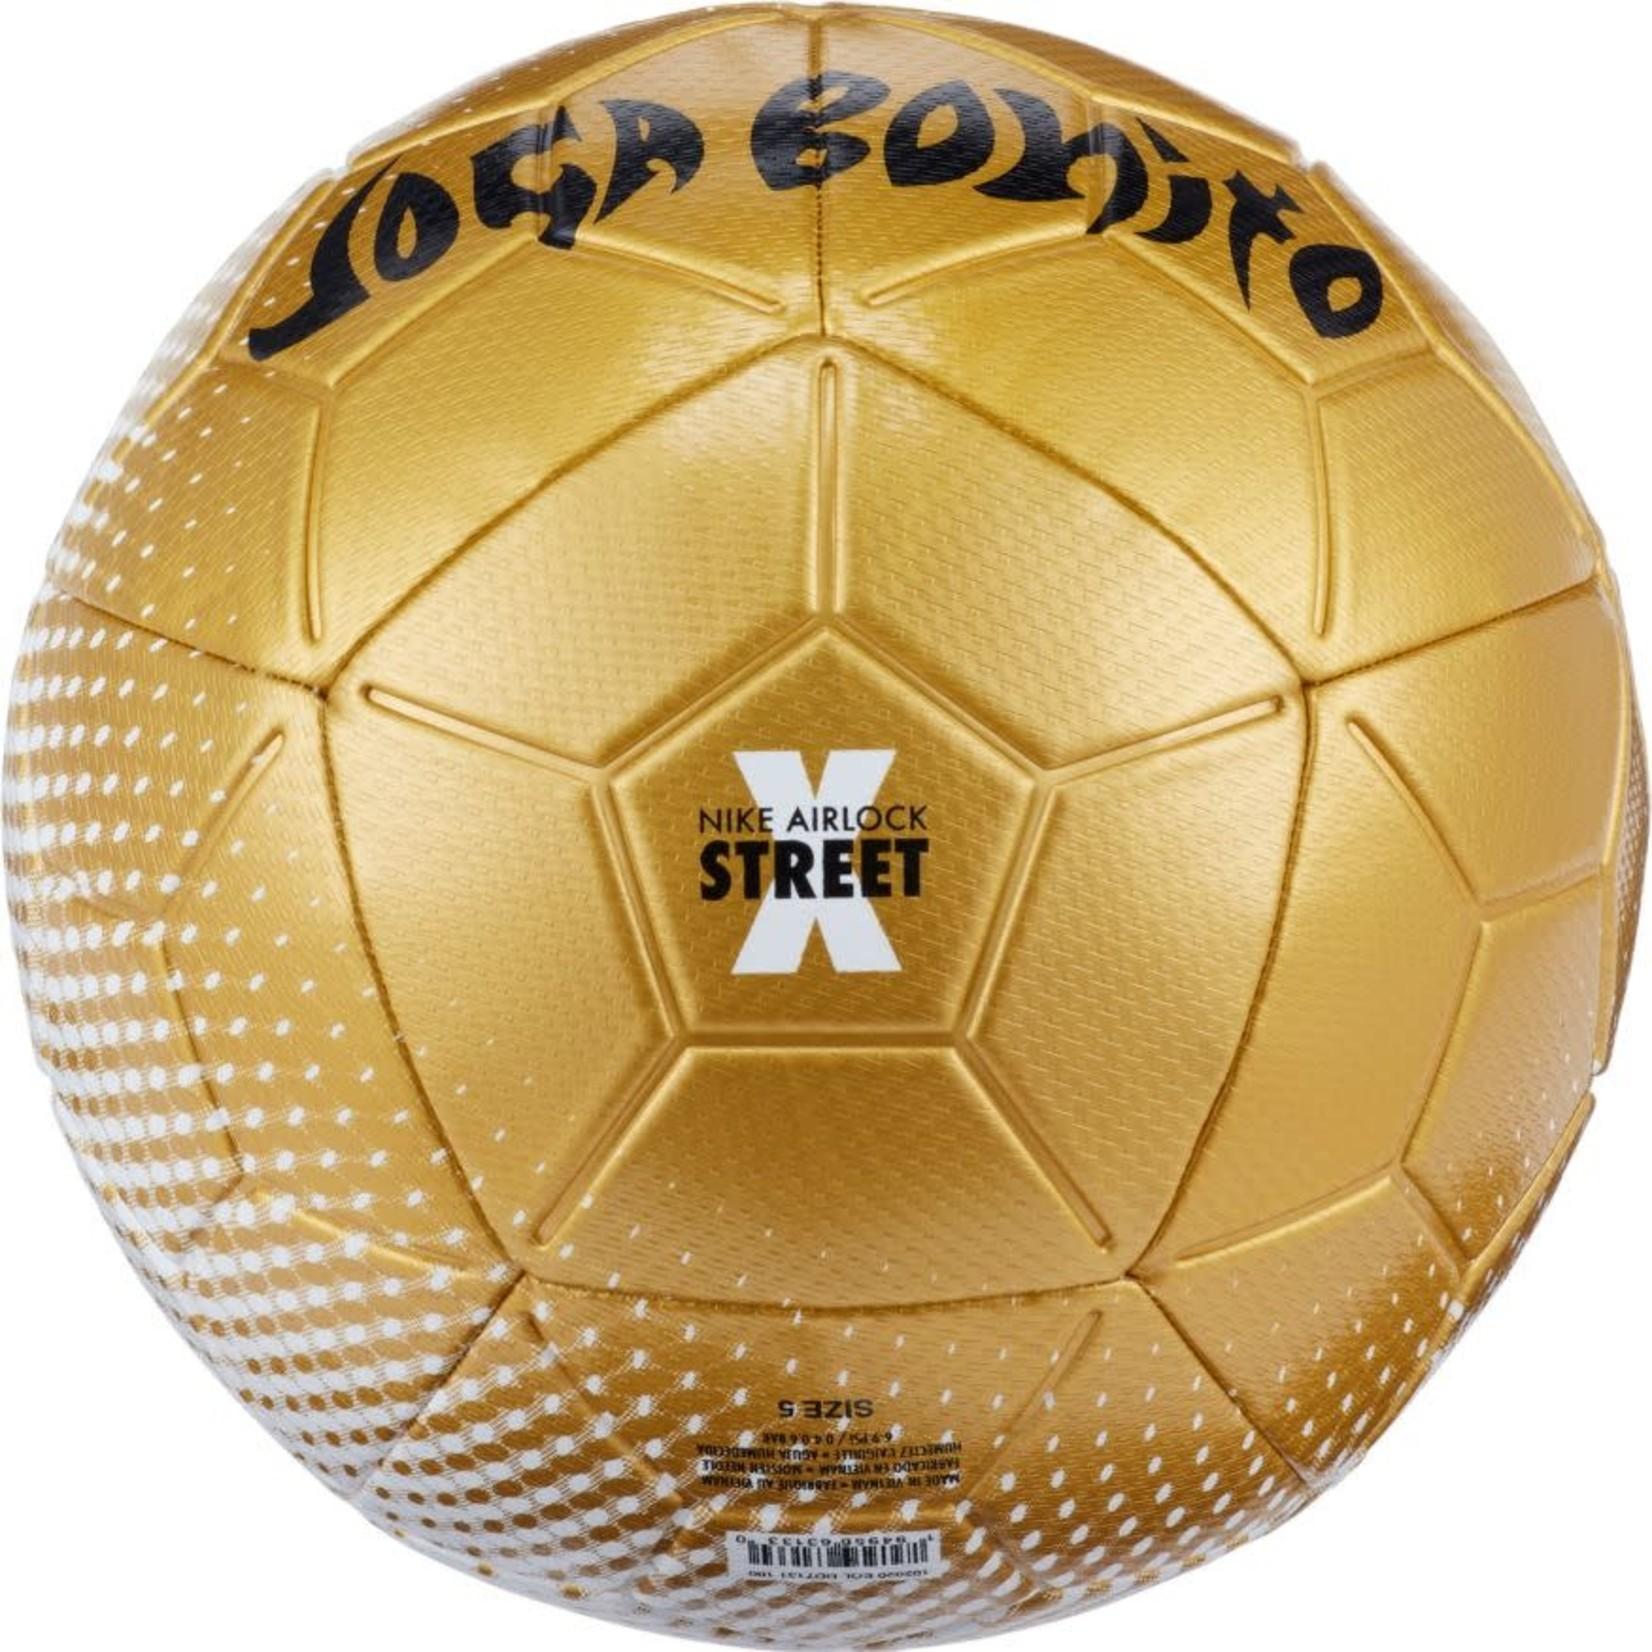 "NIKE ""NIKE FC"" AIRLOCK STREET X JOGA BONITO BALL (GOLD/WHITE)"